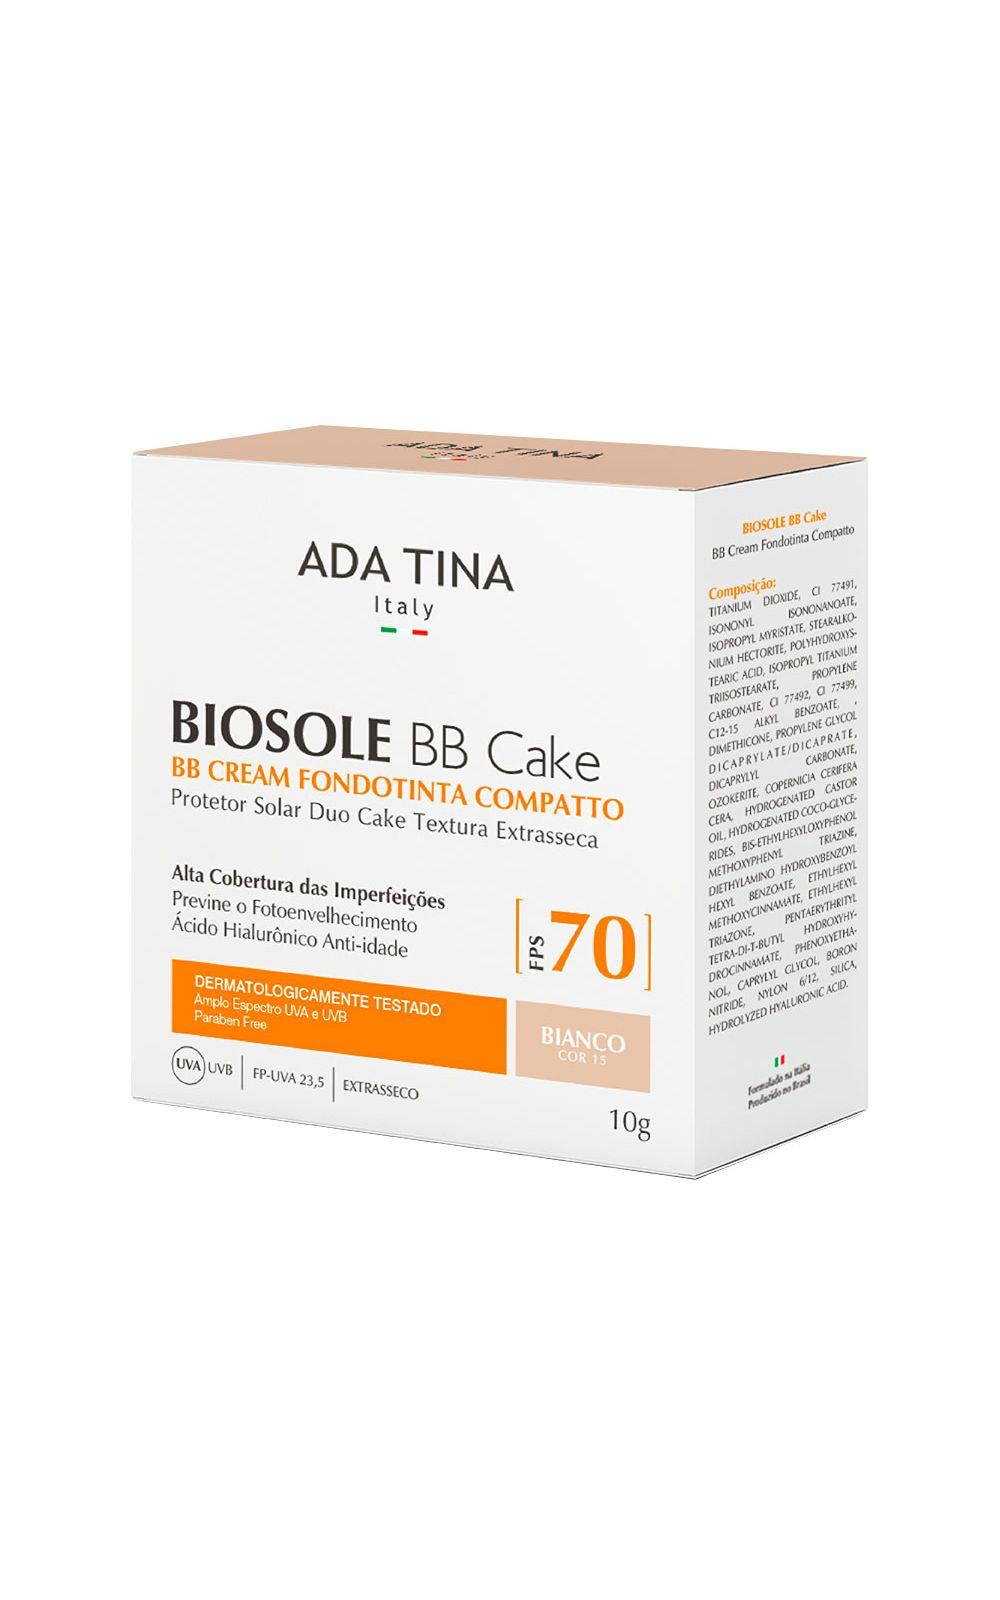 Foto 4 - Protetor Solar Anti Idade Adatina - Biosole Bb Cake FPS 70 - Bianco Cor 15